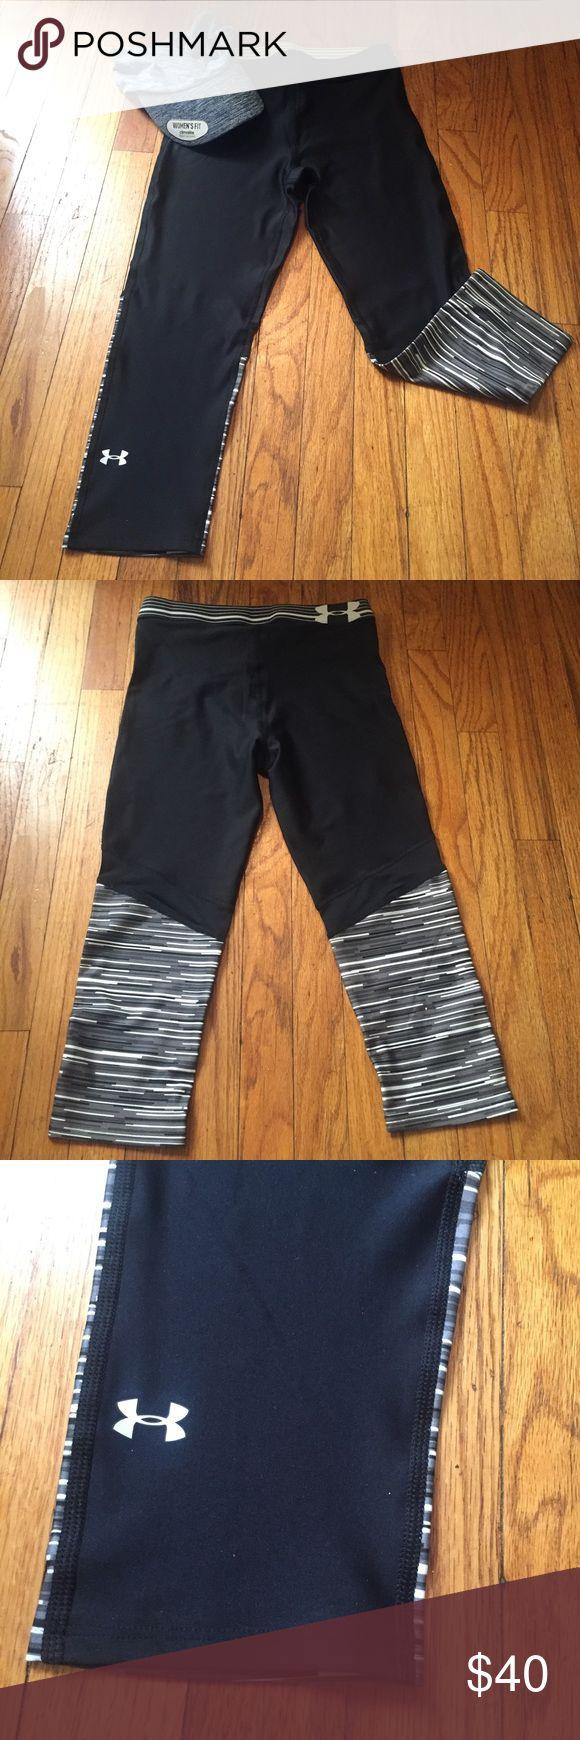 🆕 Under Armour Heatgear Capri Leggings New!  Anderson Armour Heatgear Compression FIT.  80% Polyester/ 20% Elastane Under Armour Pants